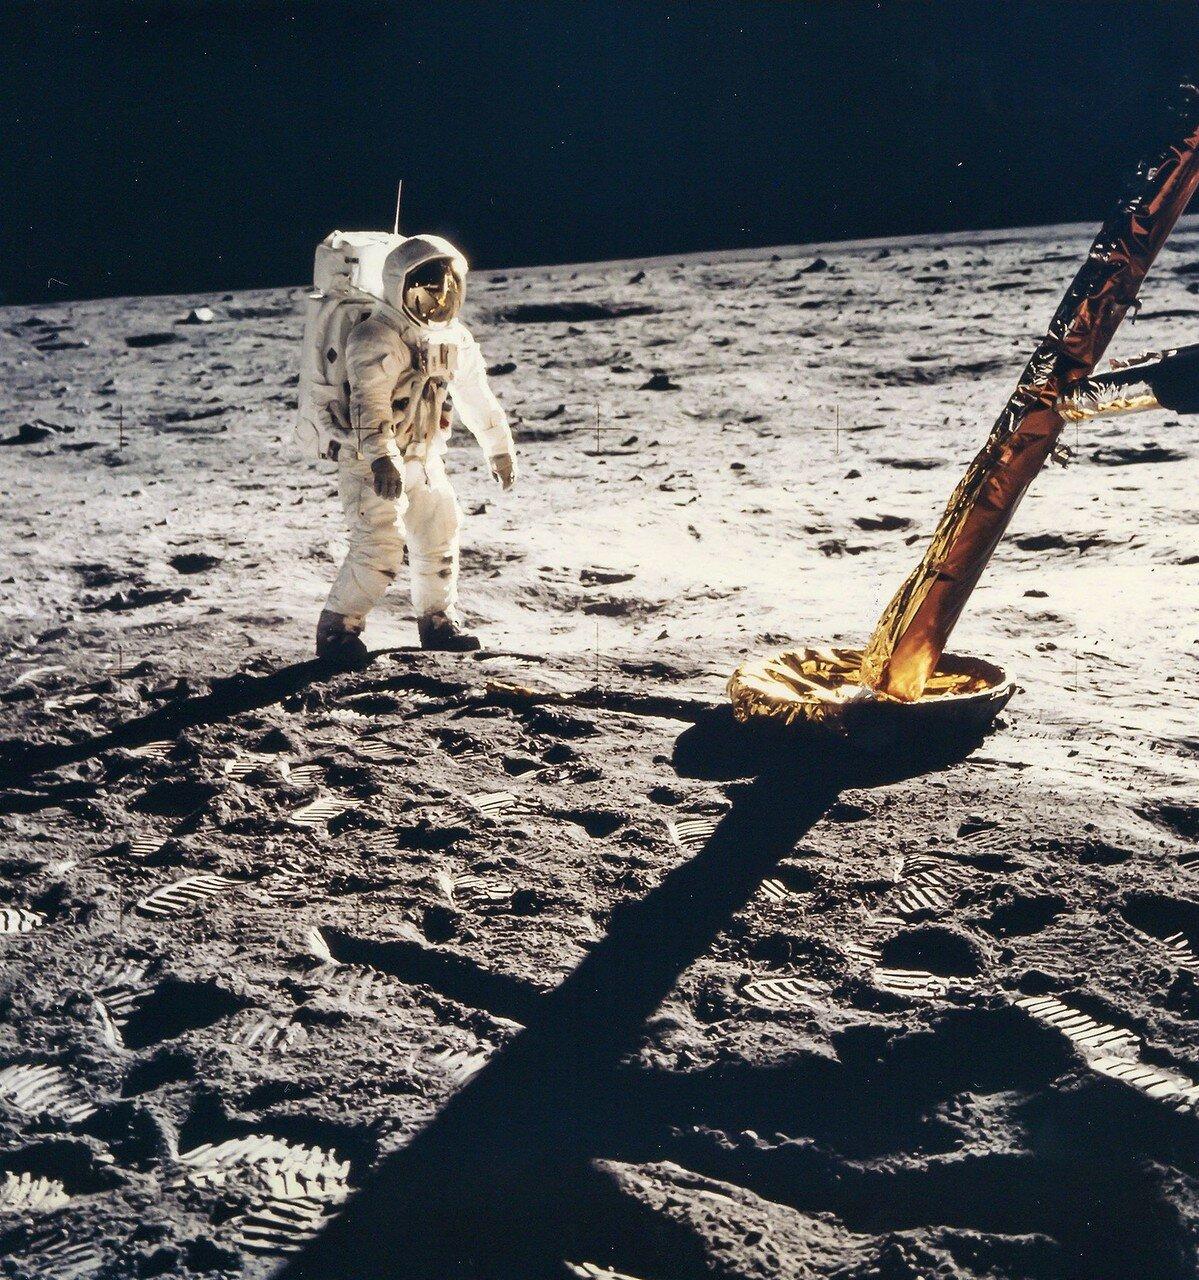 Базз Олдрин идет в сторону Лунного Модуля